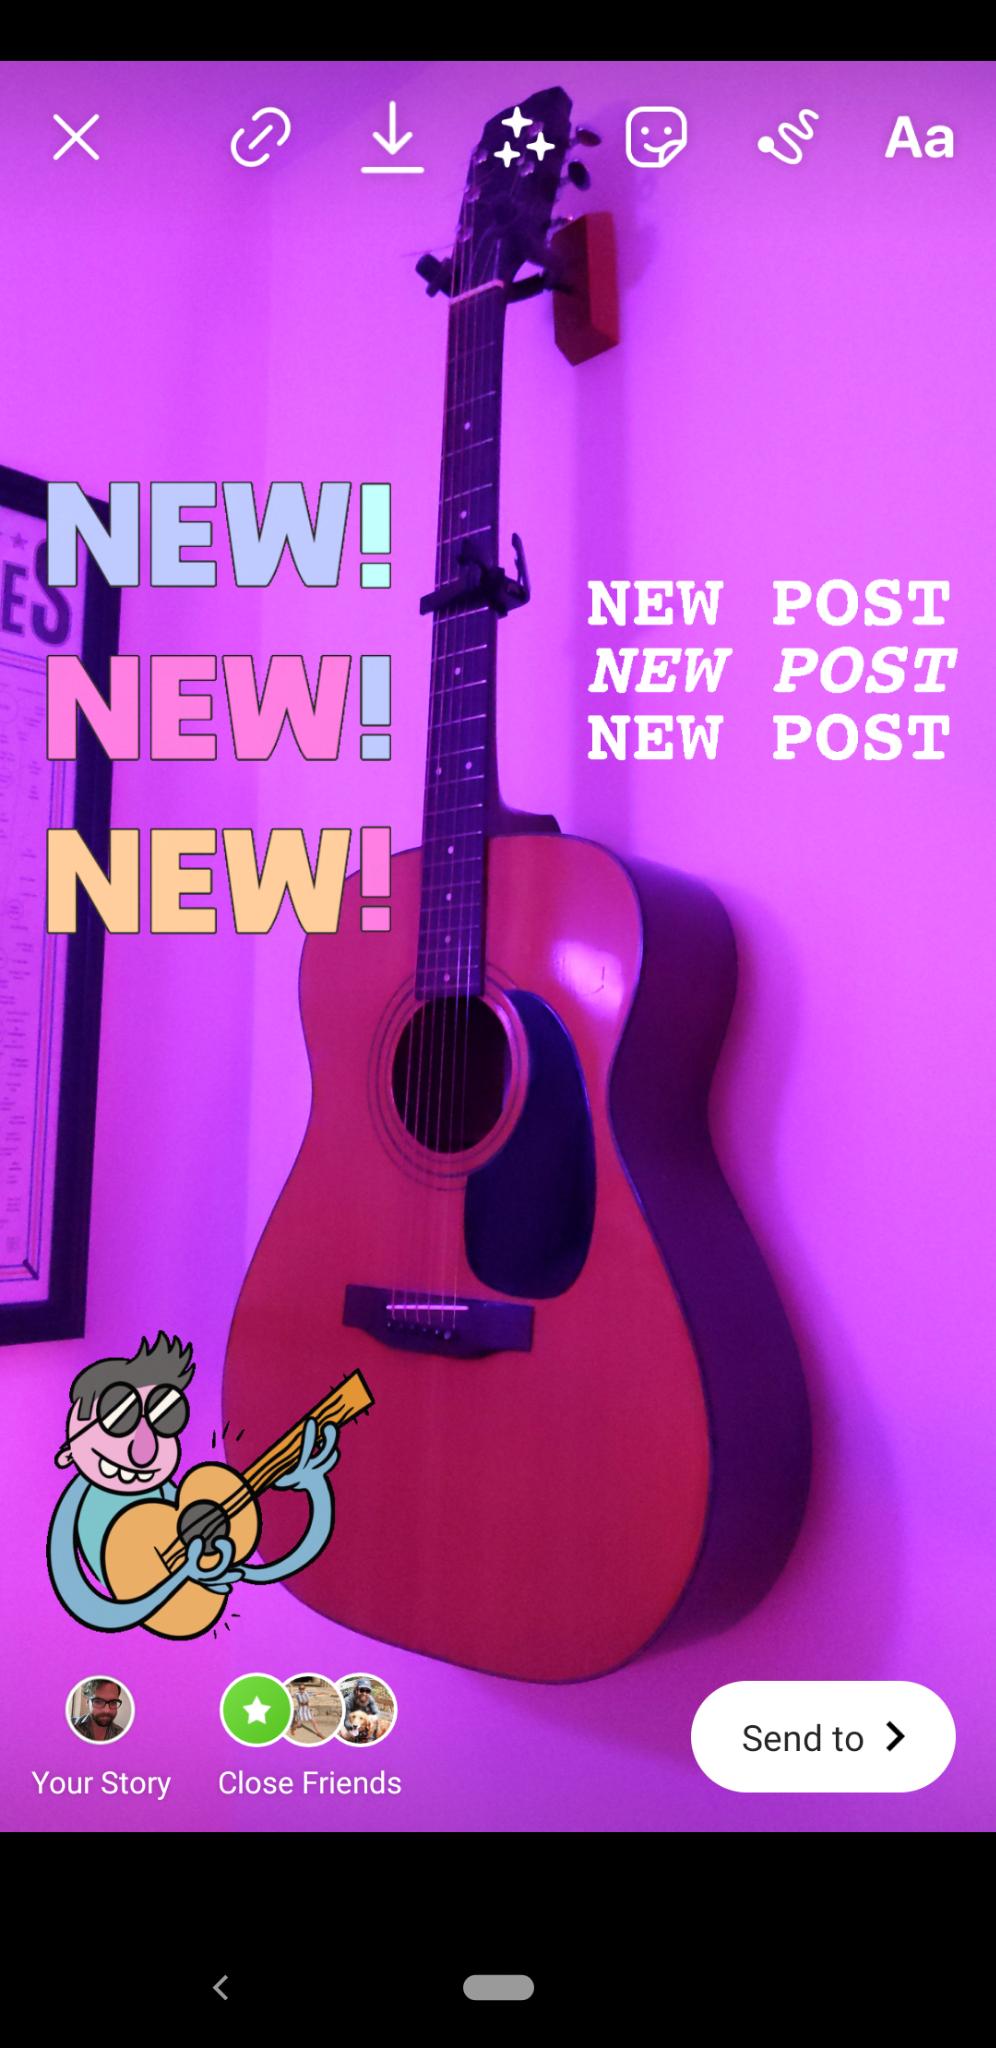 Instagram Stories new post